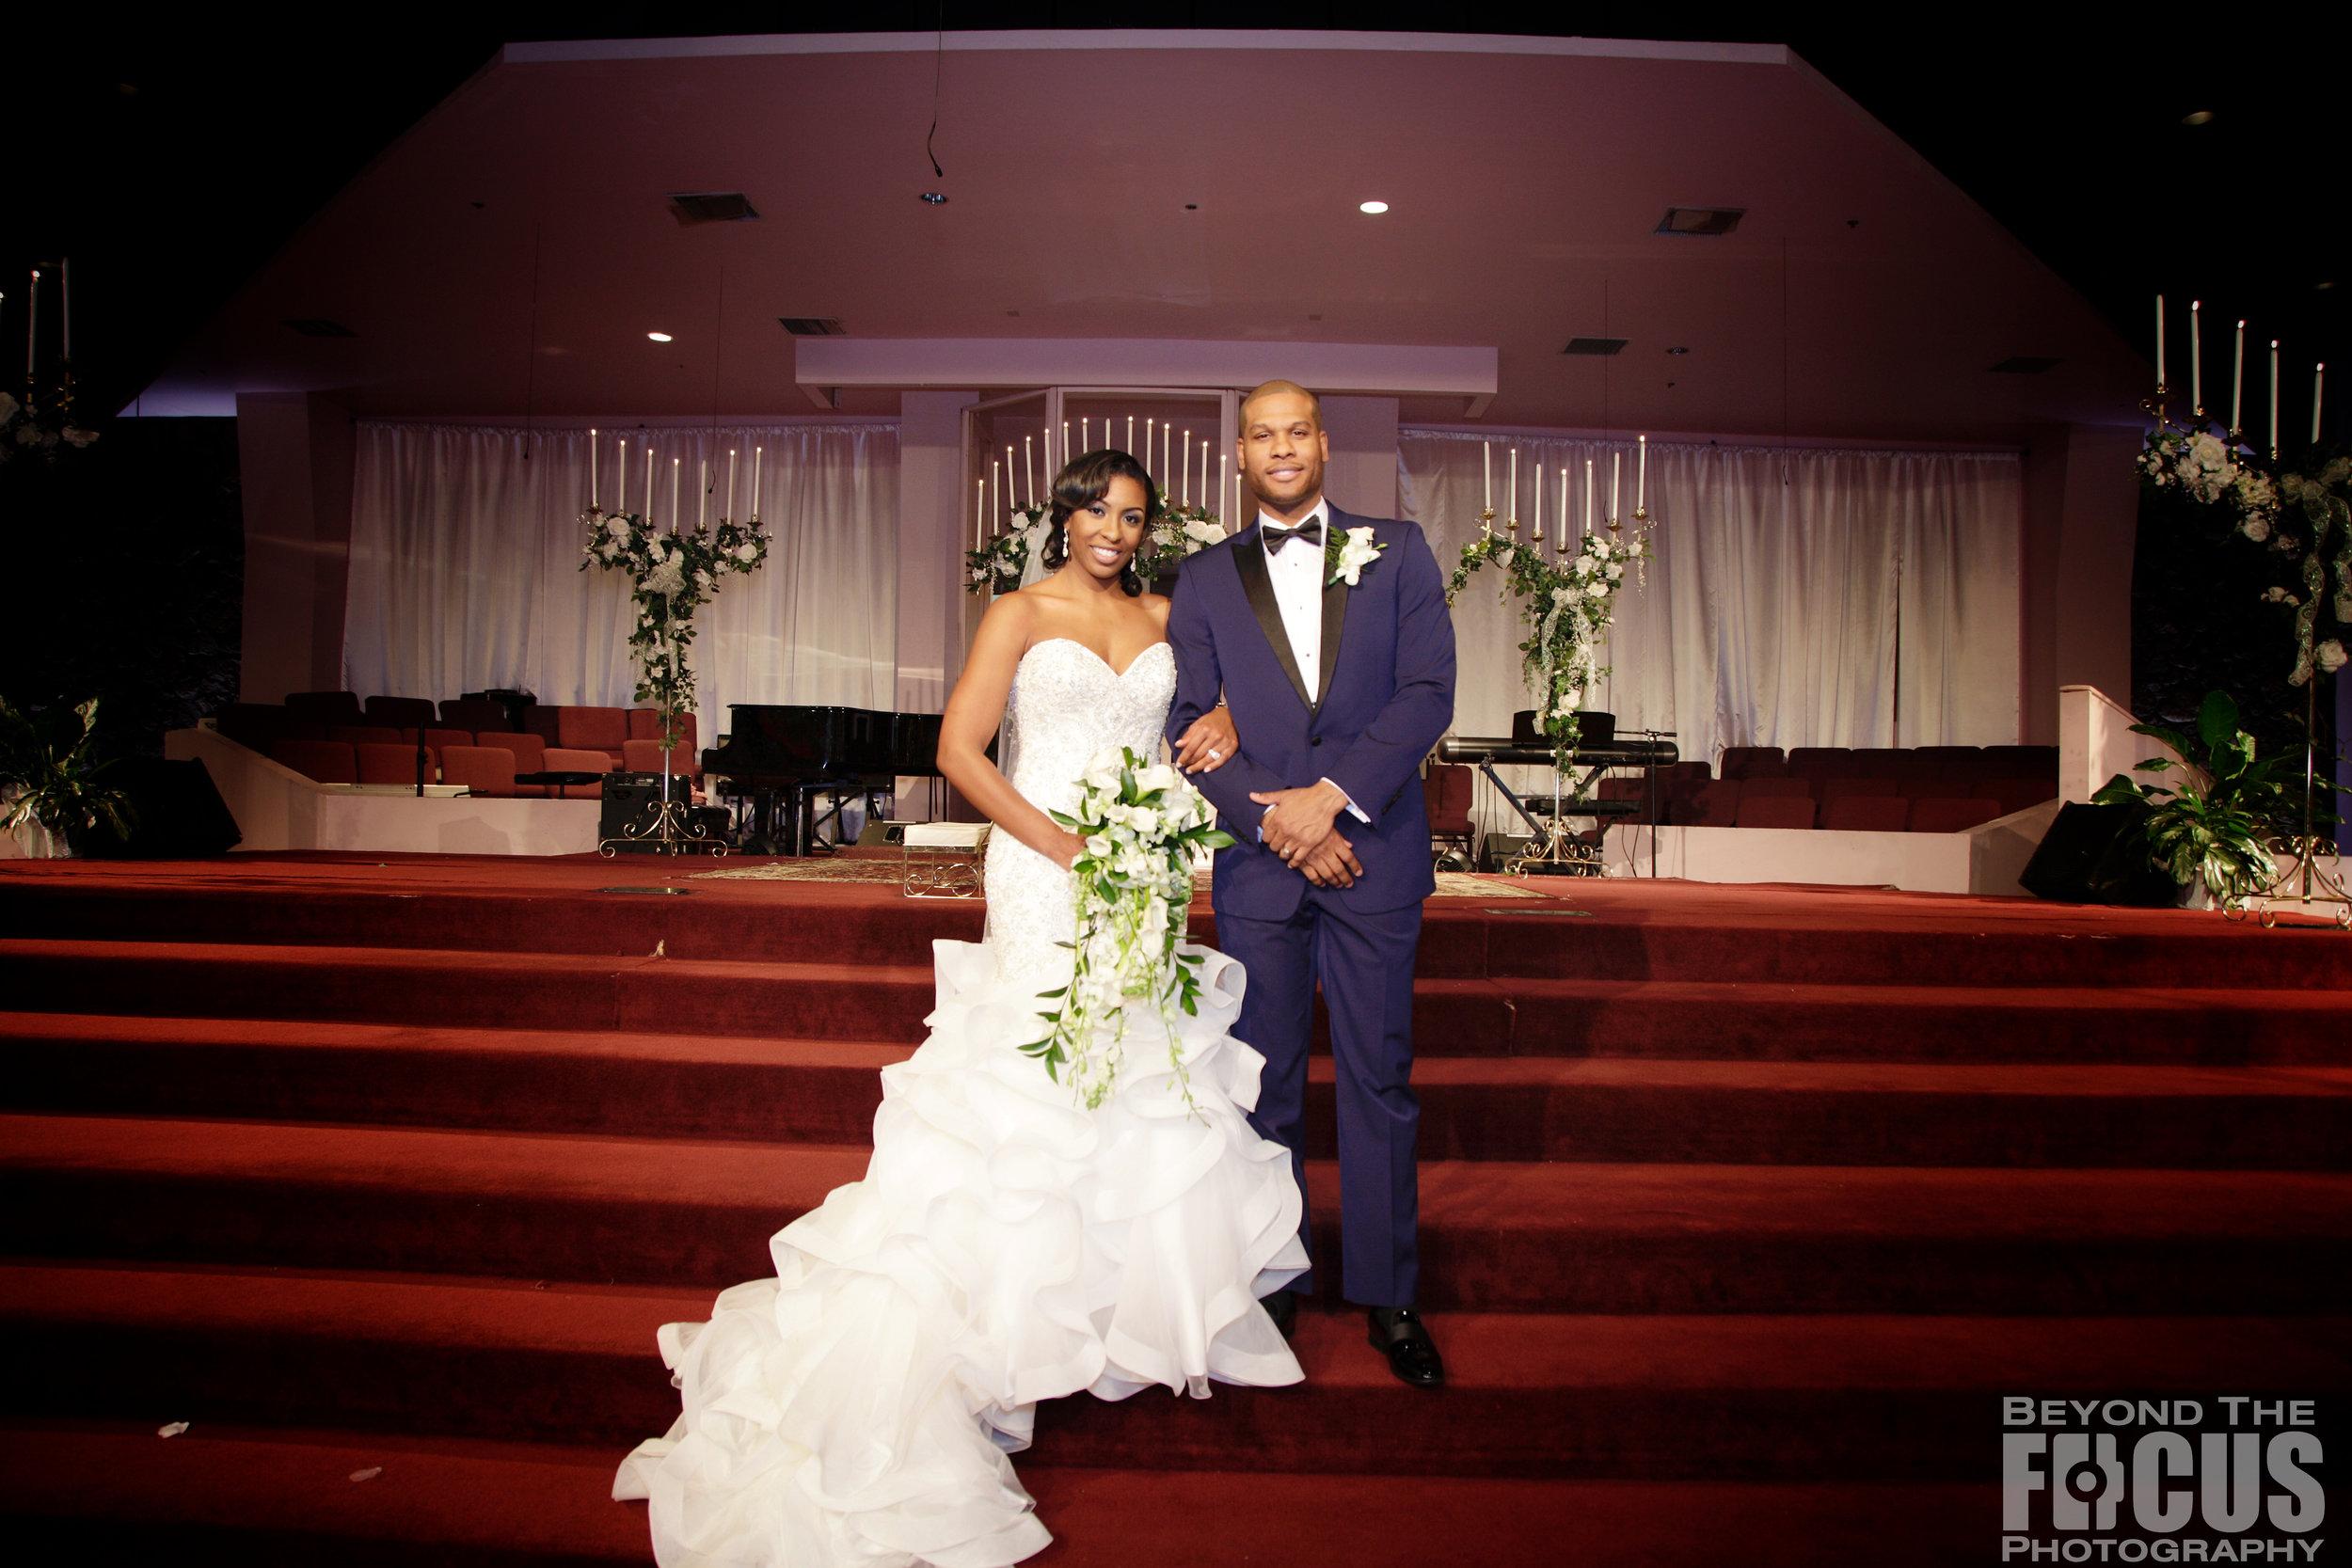 Matthews_Wedding_Ceremony_148.jpg